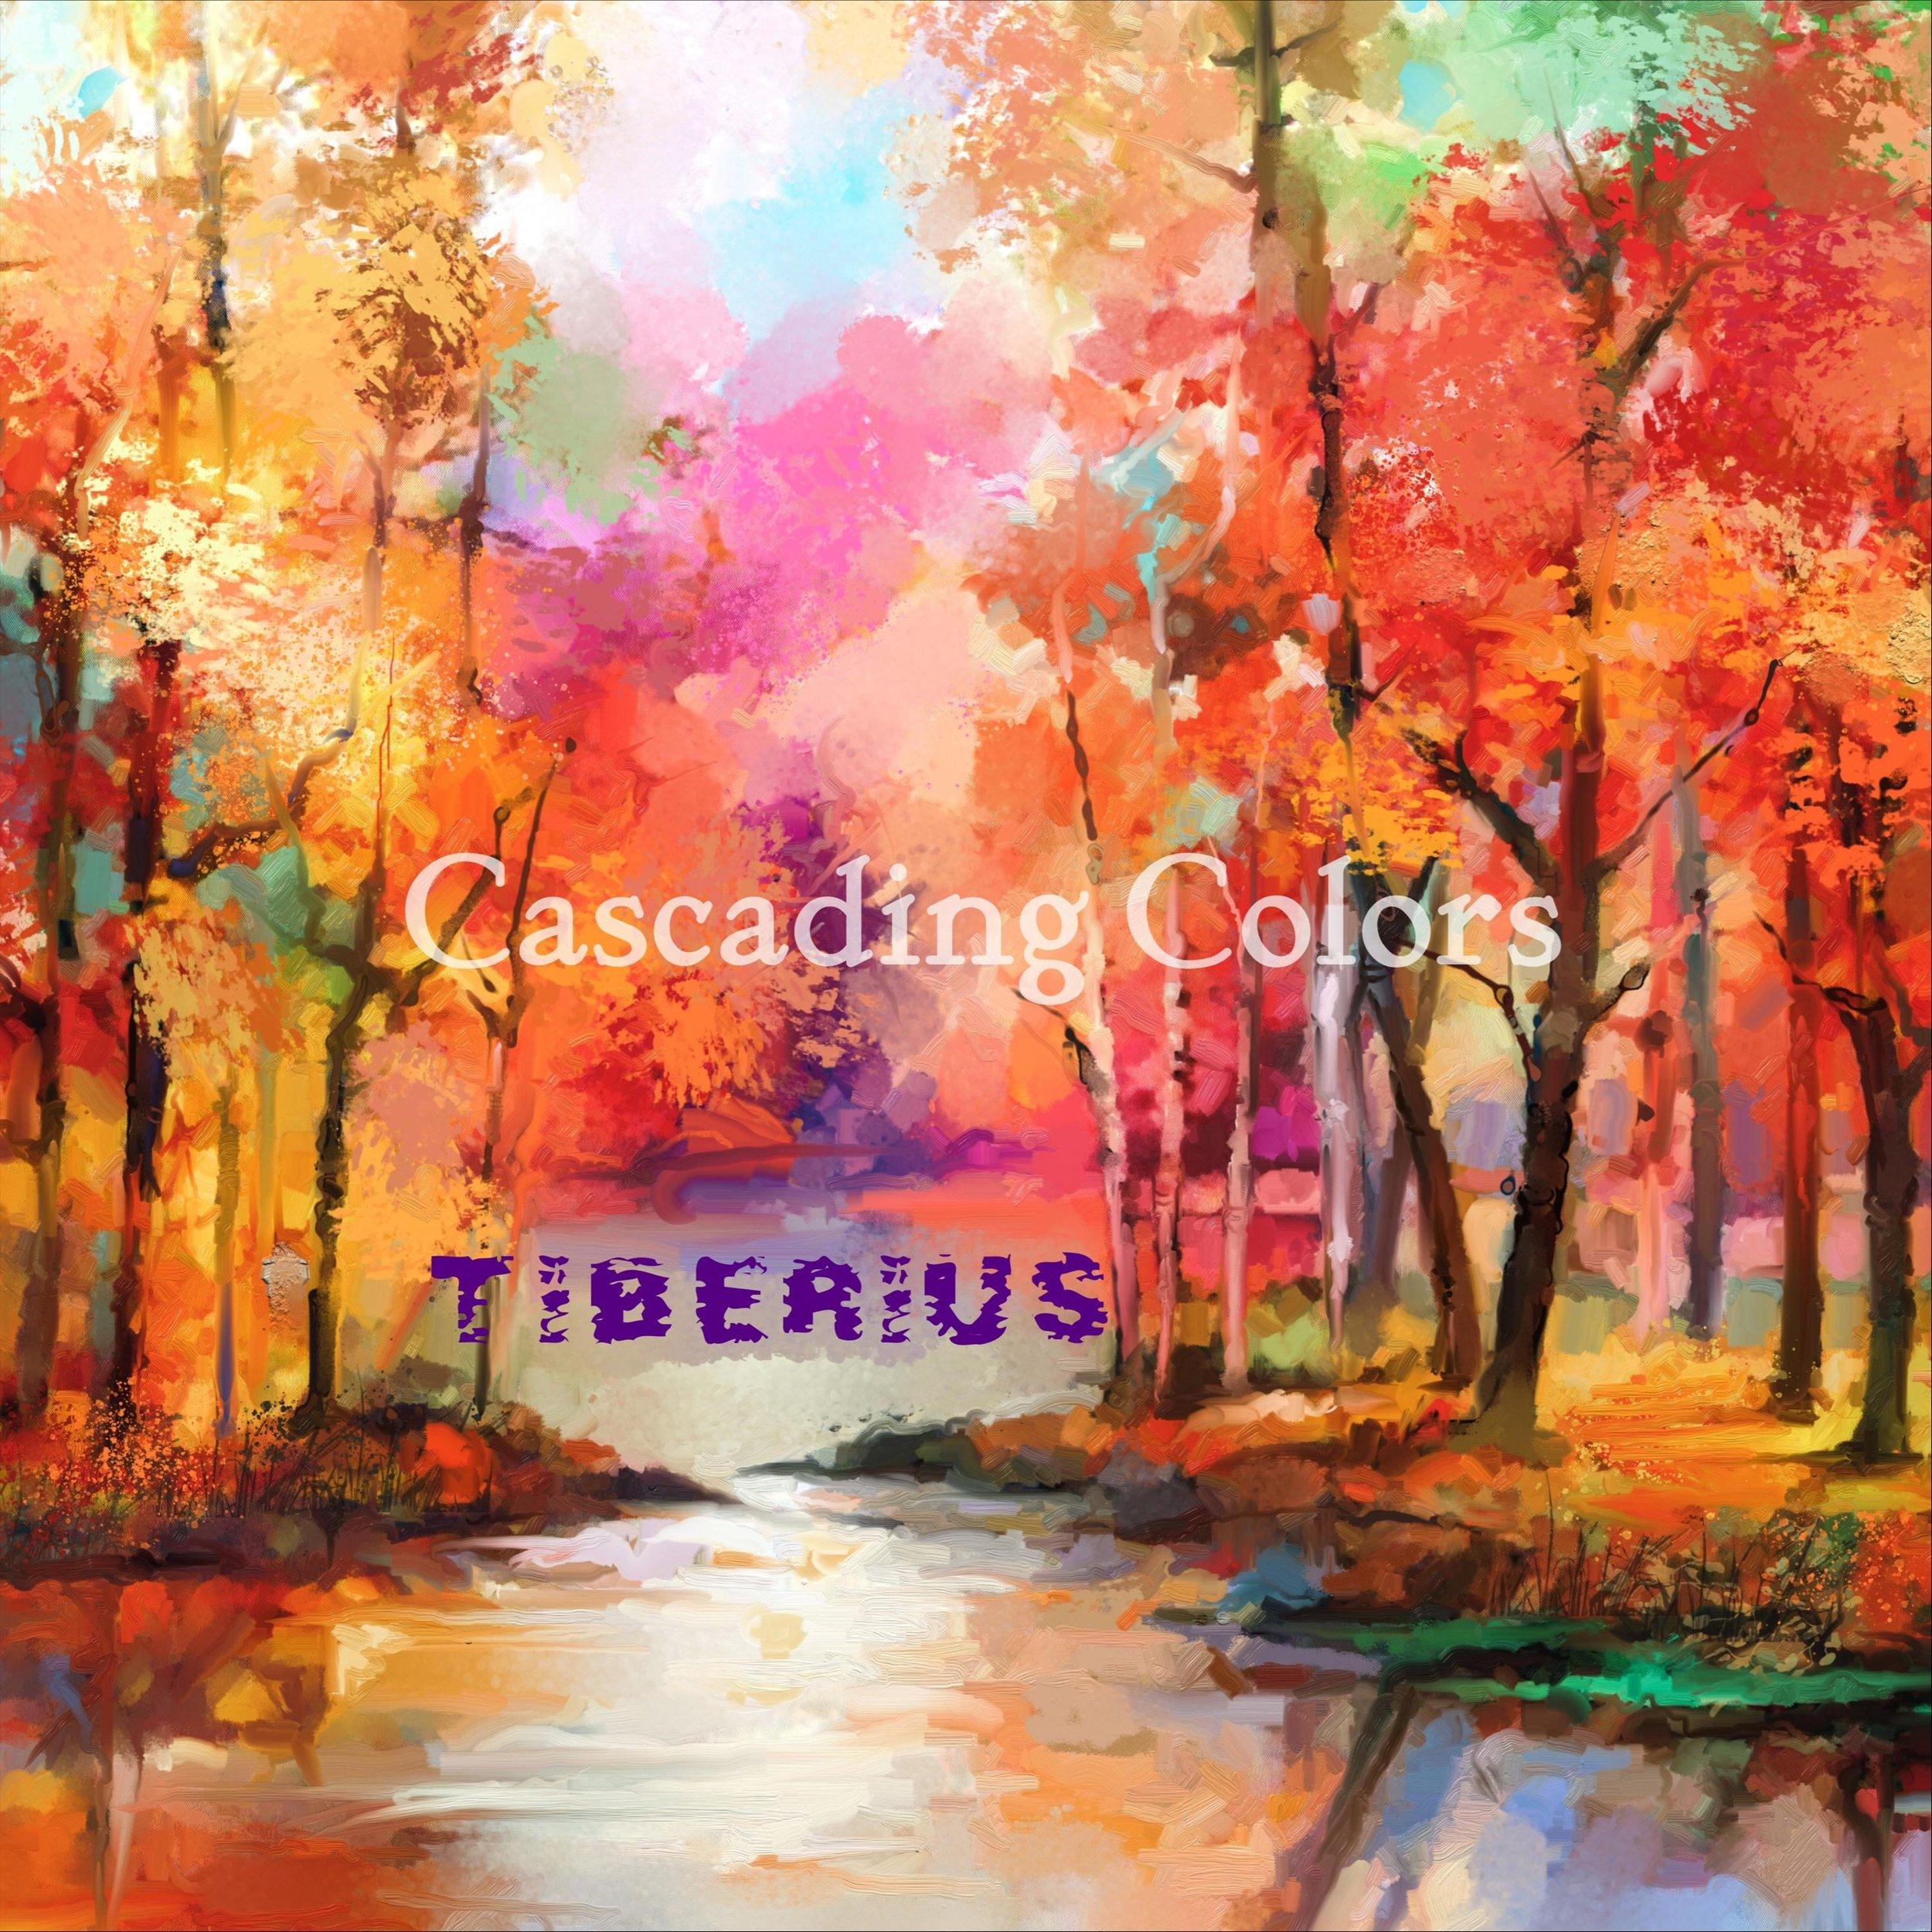 Tiberius Cascading Colors 8:23:19.jpg